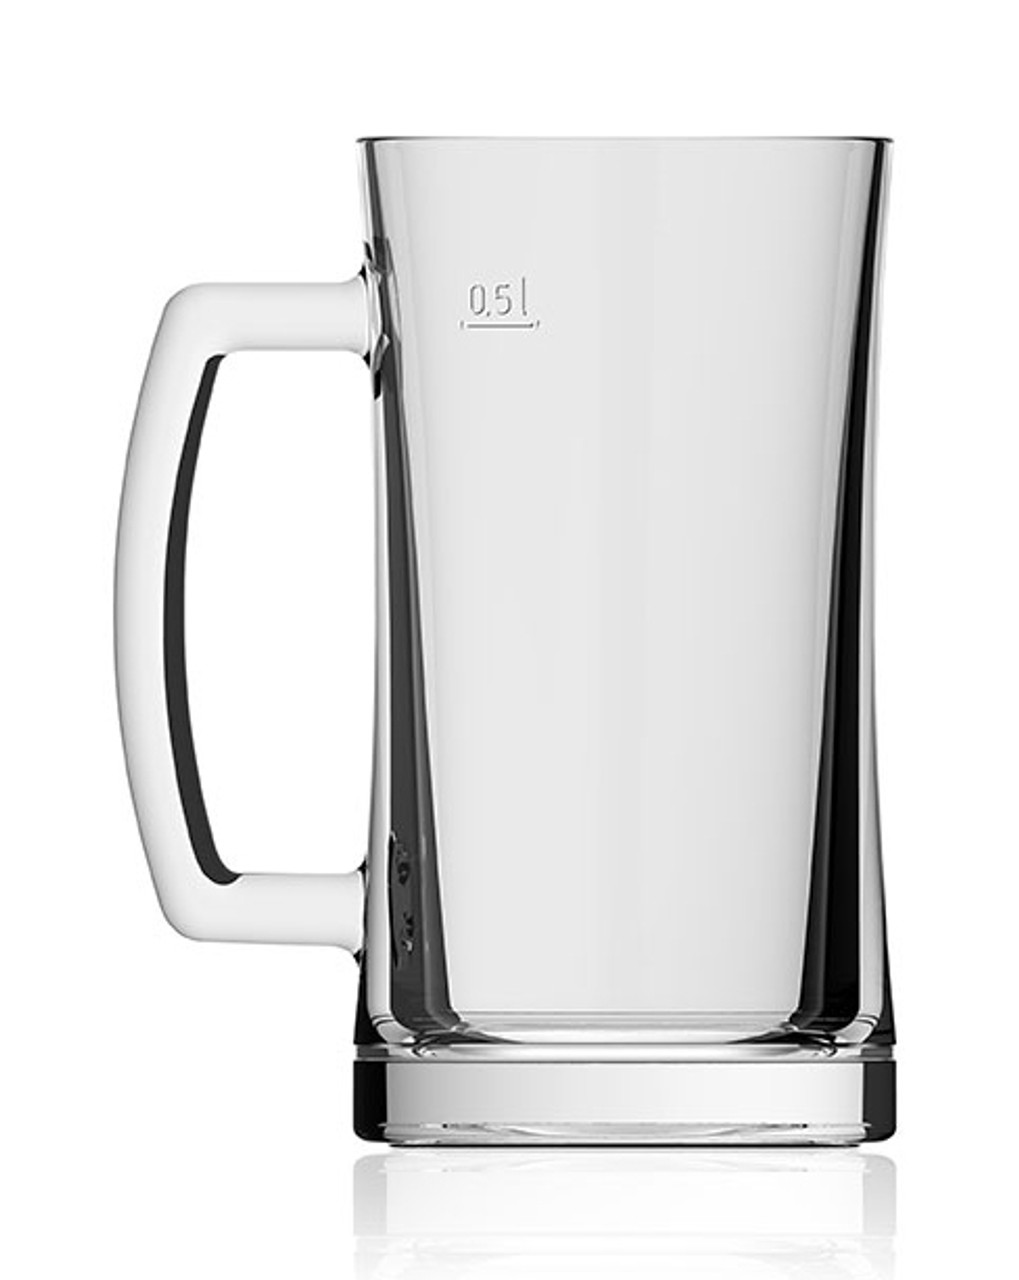 Kora Glass Beer Mug 0.5 Liter